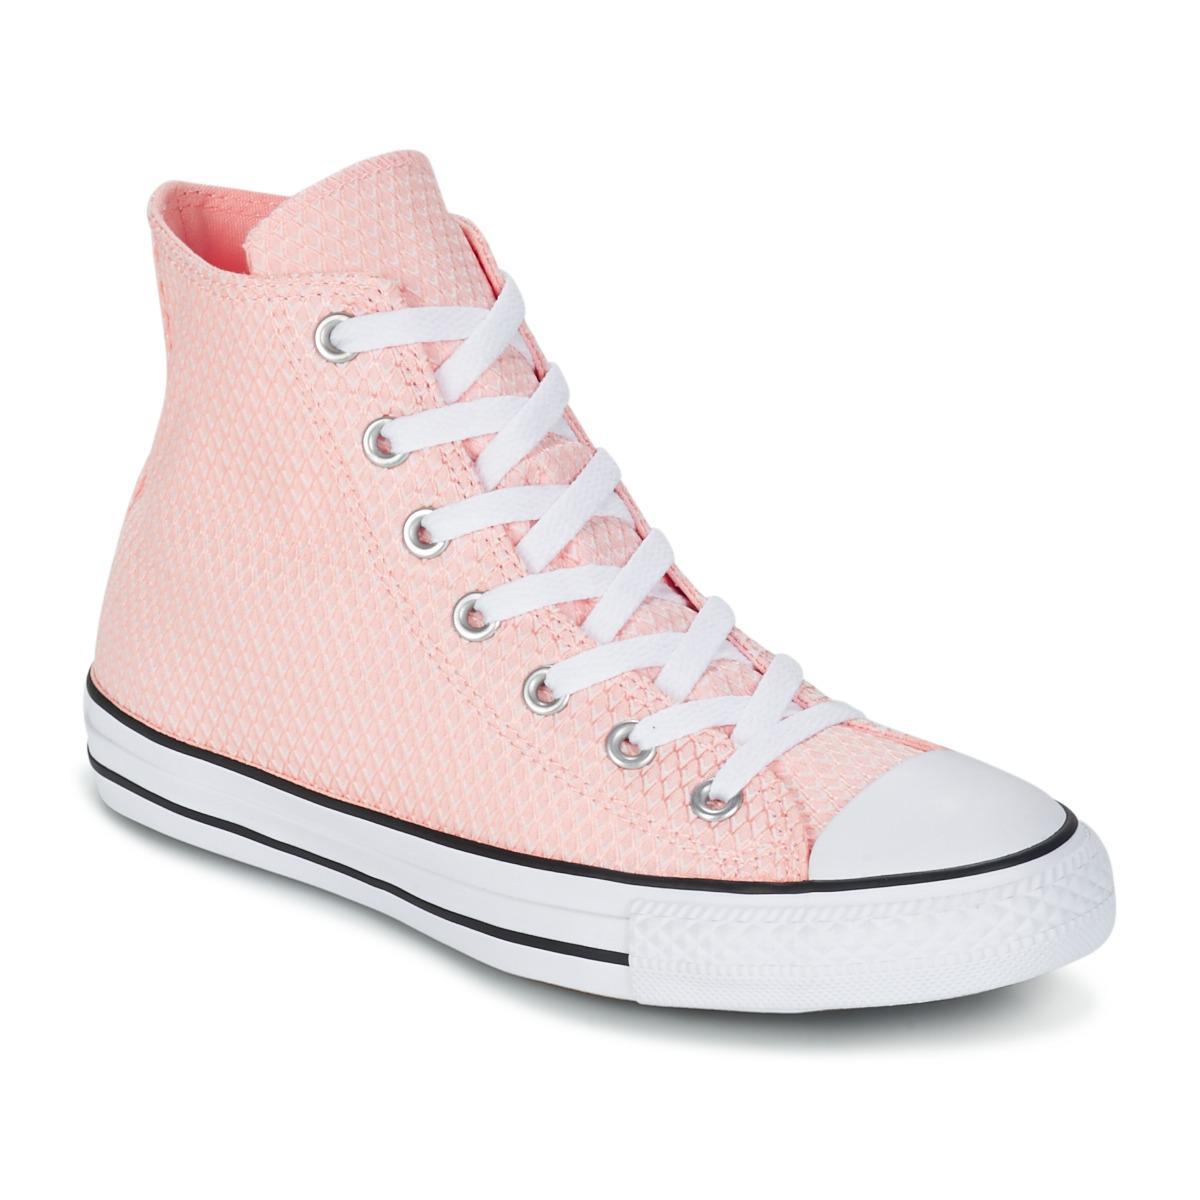 ca42f3907540 Converse Chuck Taylor All Star Snake Woven Hi Women s Shoes (high ...